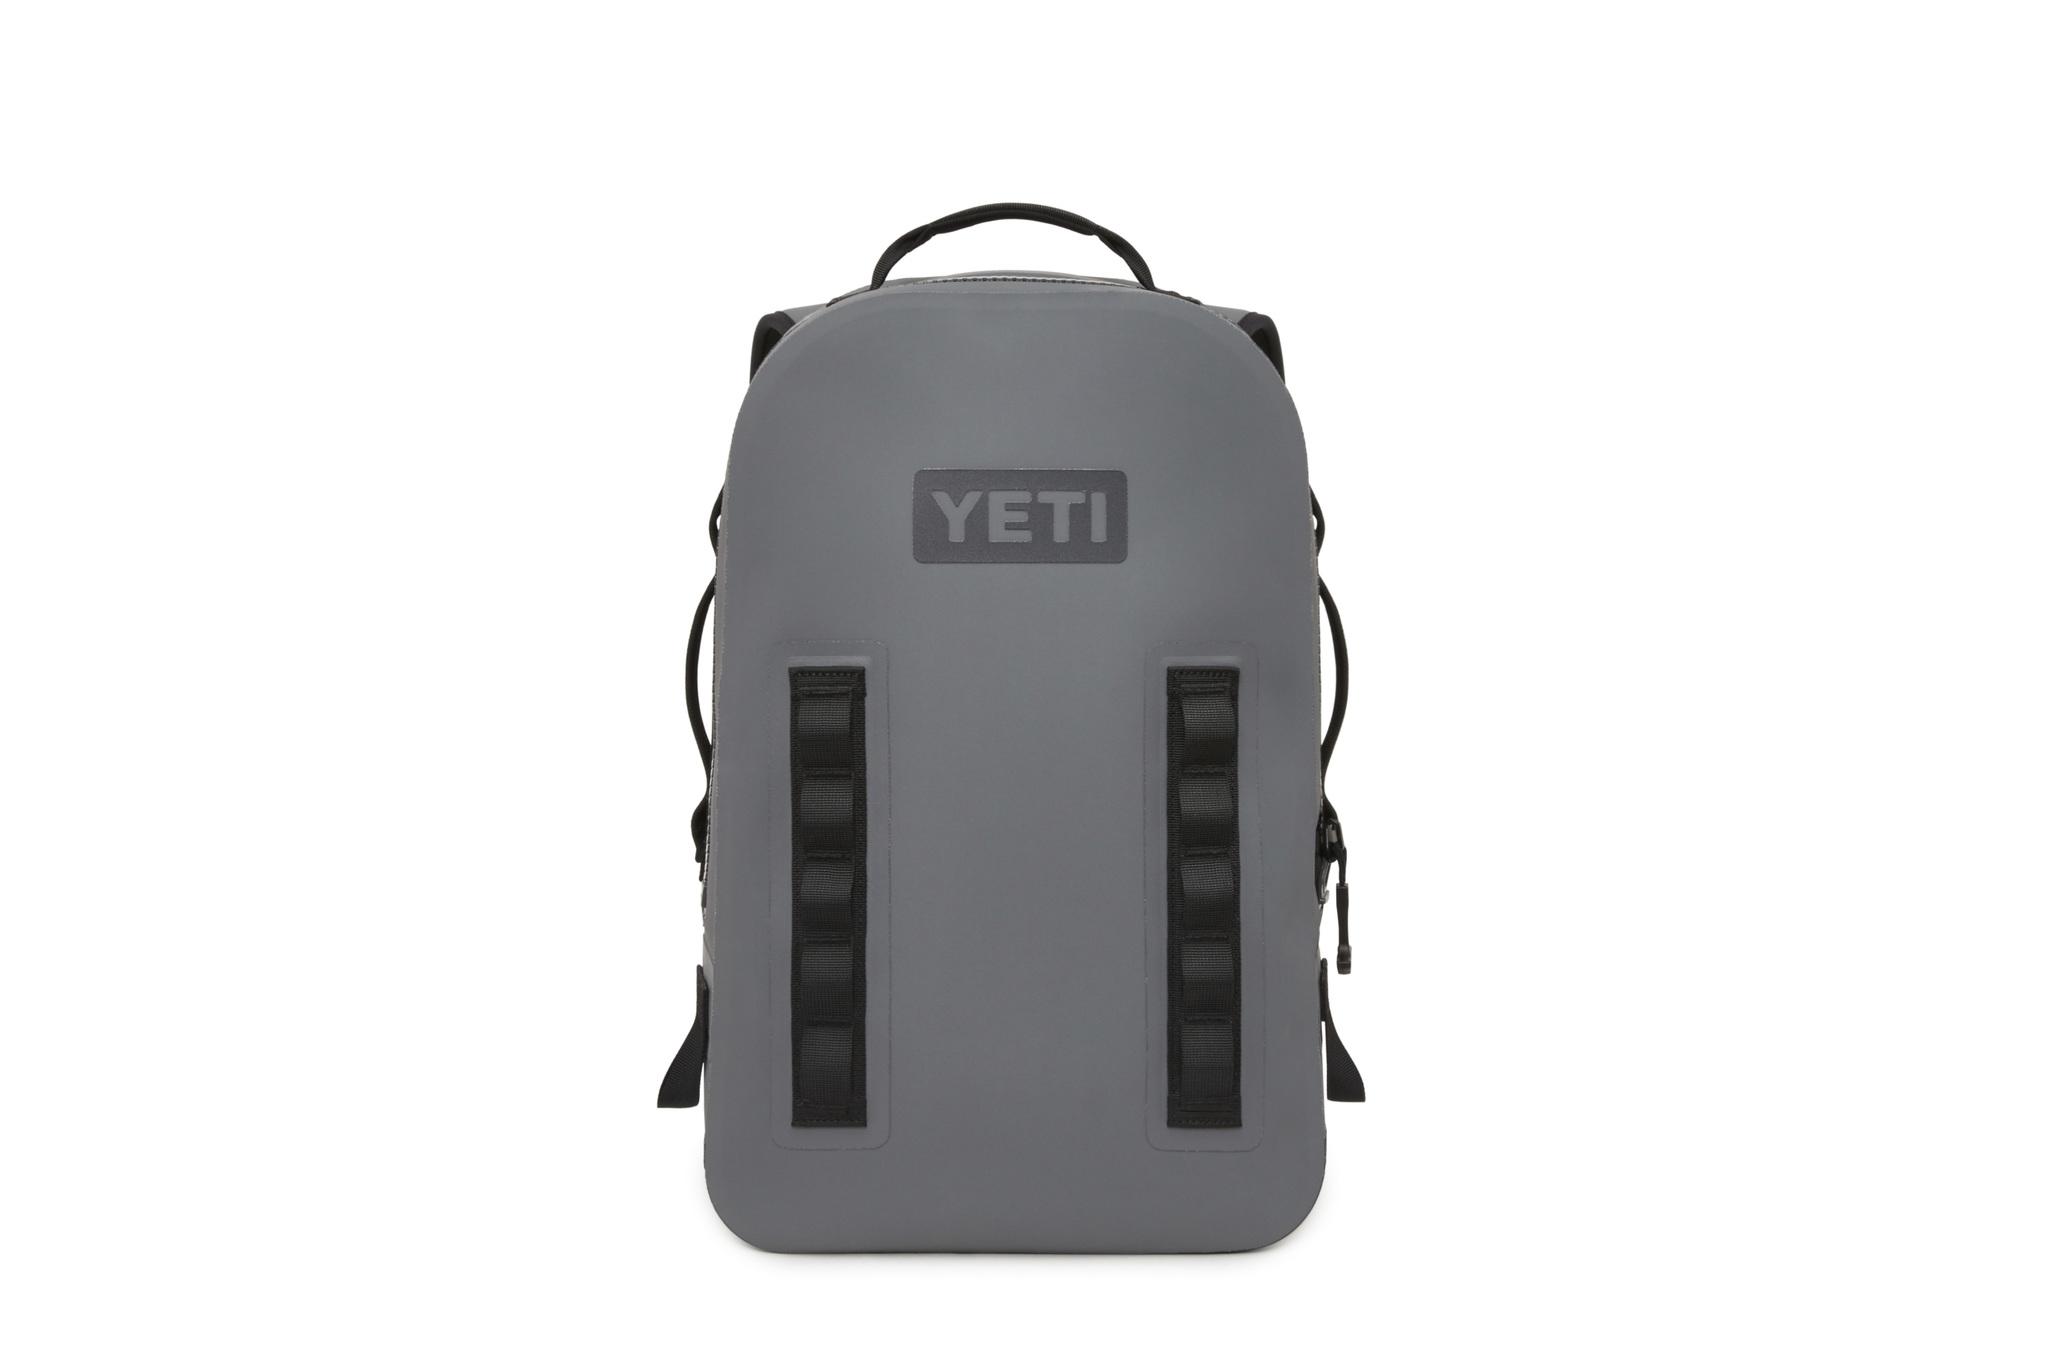 YETI Panga Waterproof Backpack Review Payne Outdoors